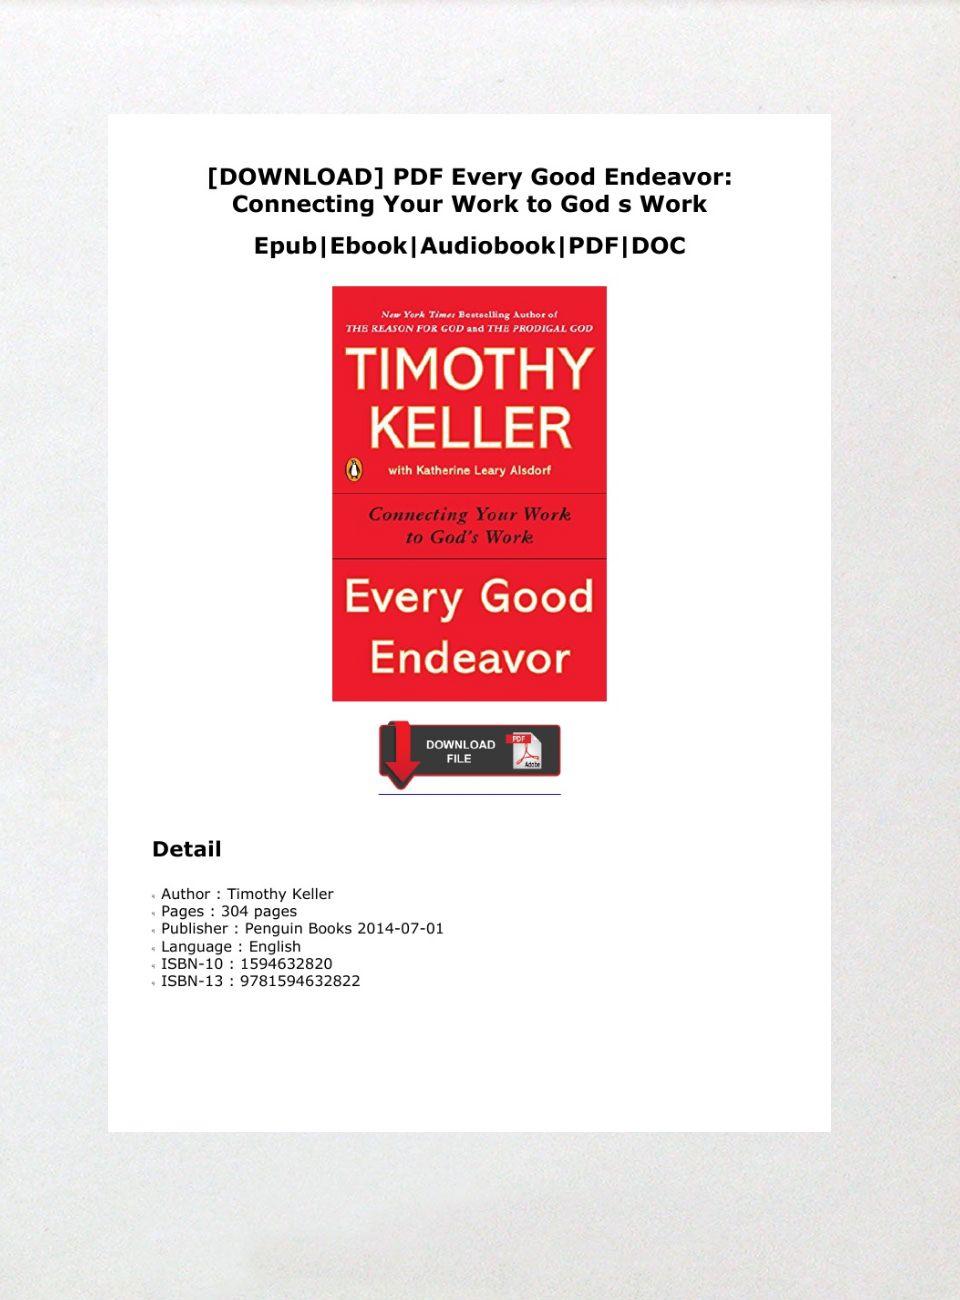 Every Good Endeavor Pdf Download